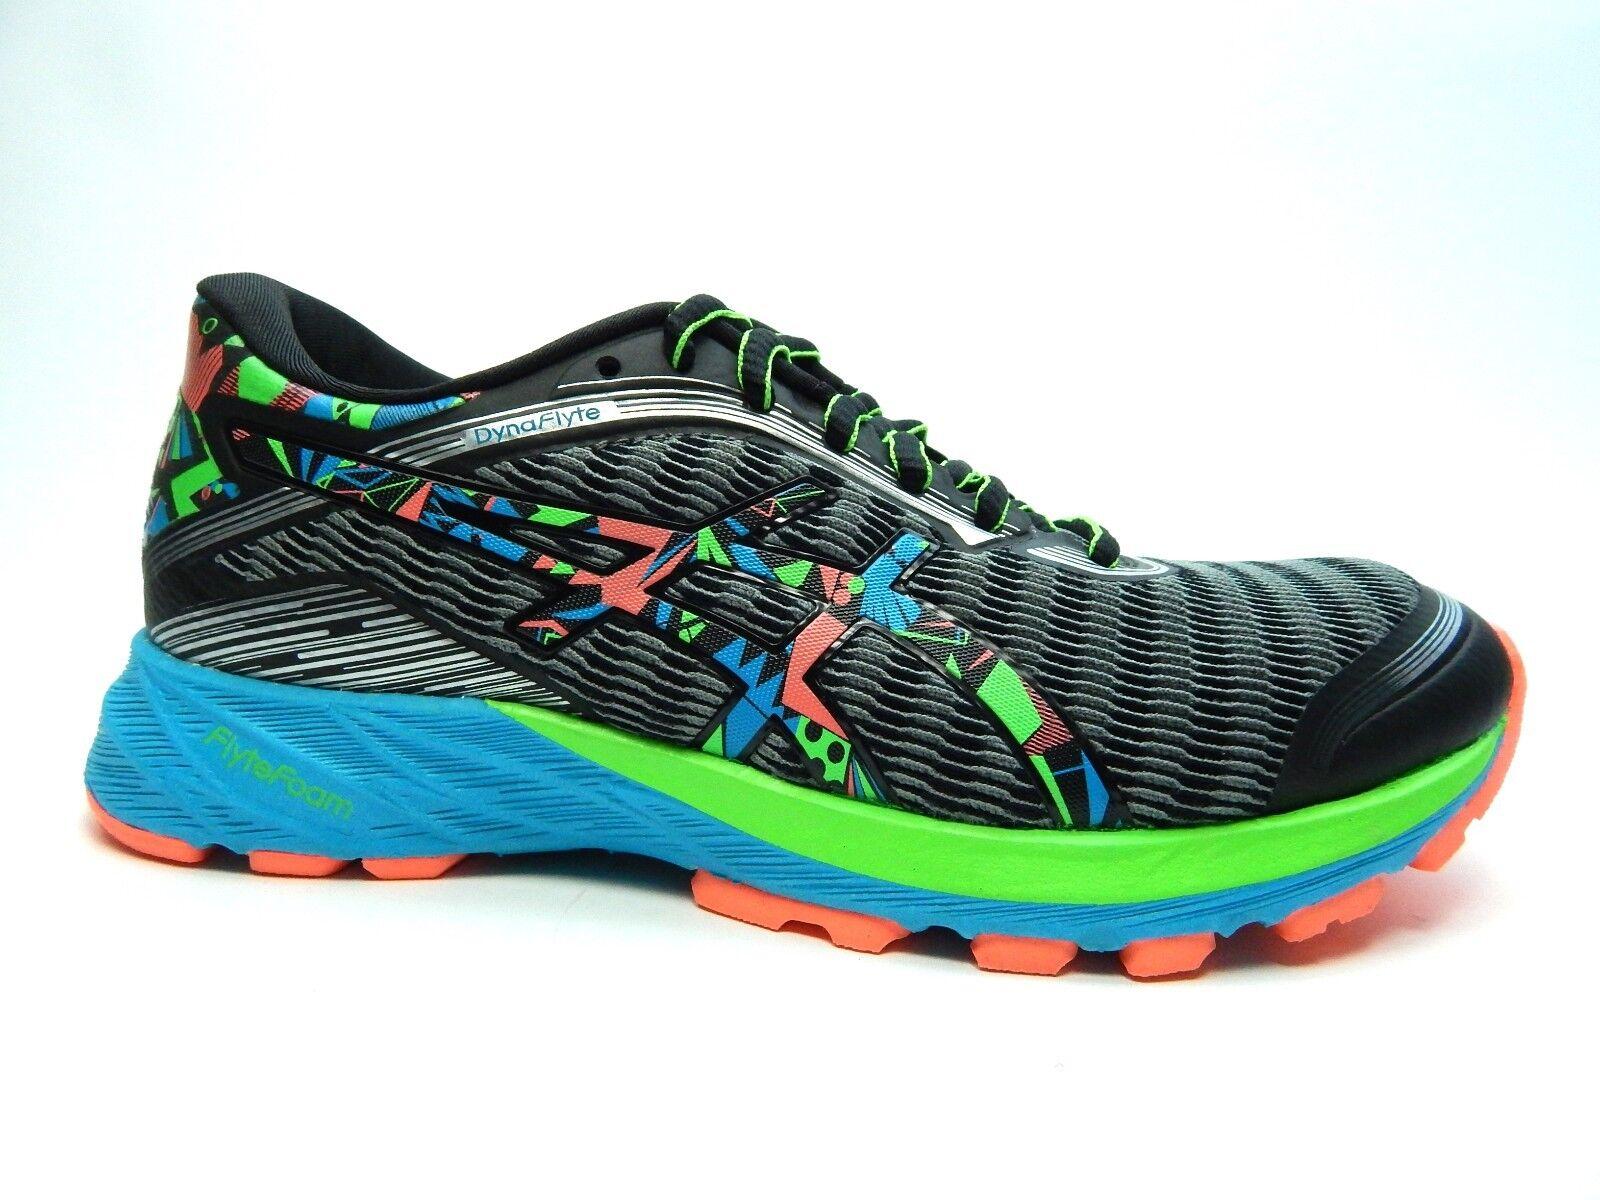 Asics dinaflyte T6F8J mujeres 9002 Castlerock multinegro mujeres T6F8J zapatos talla 5.5 bcf401